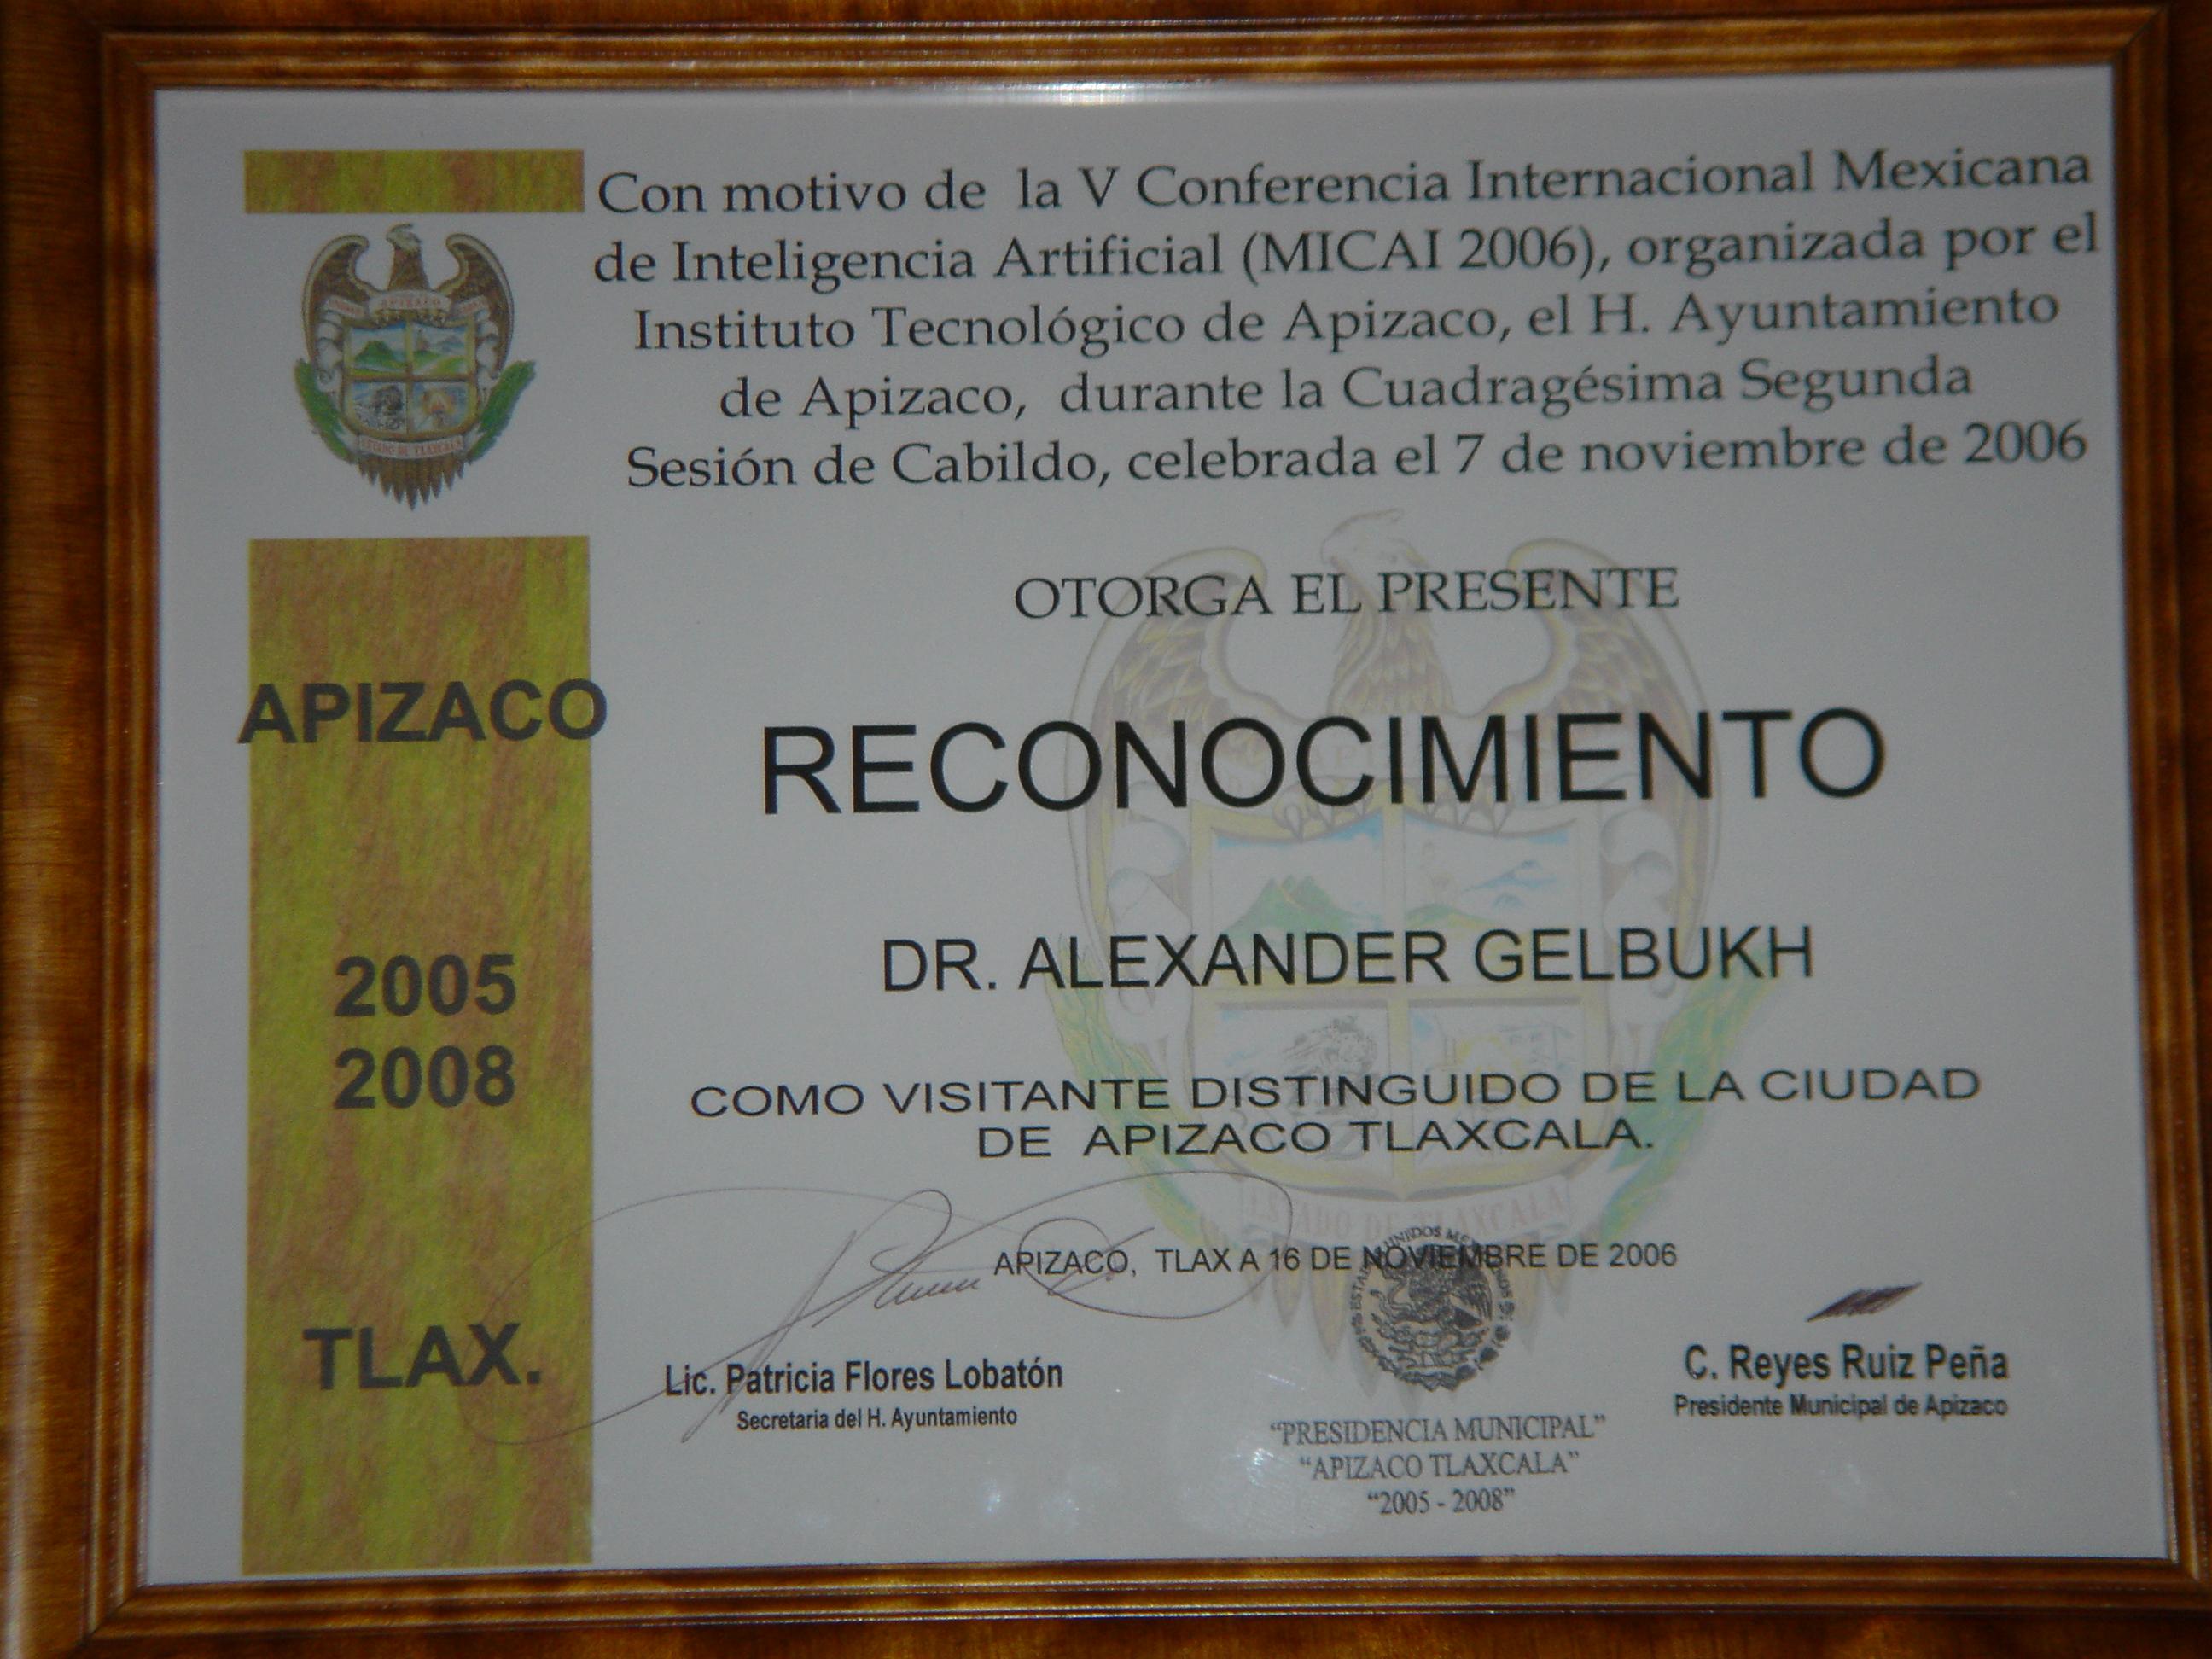 Alexander Gelbukh -- Curriculum Vitae